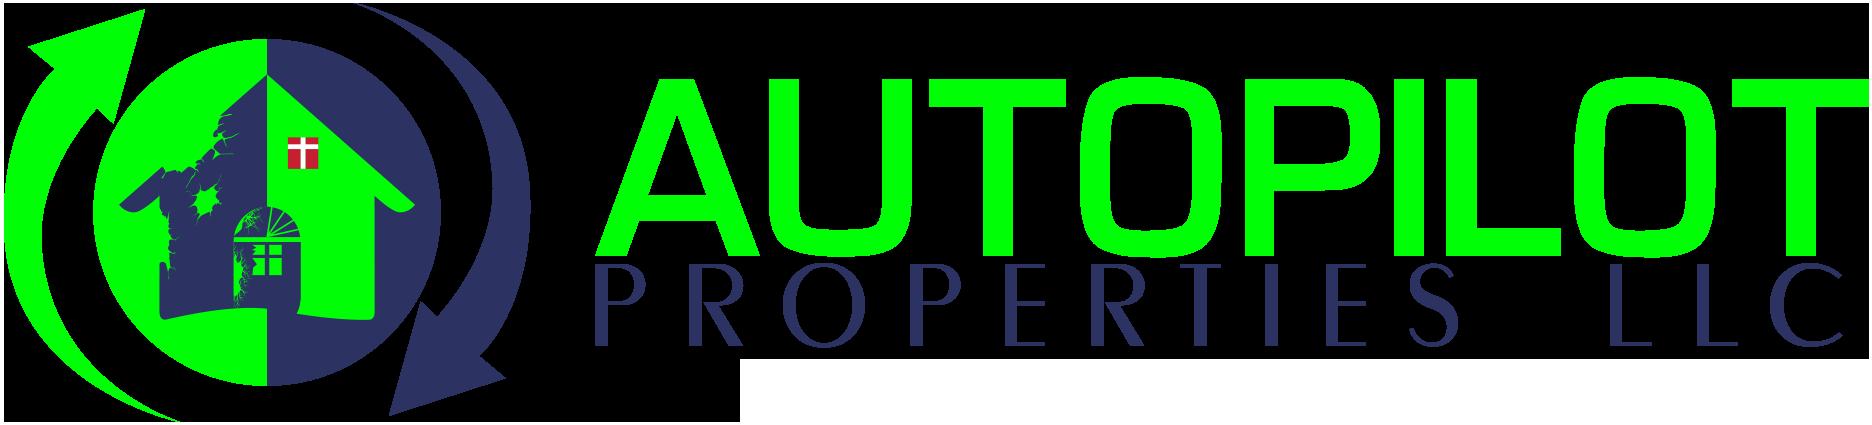 Autopilot Properties